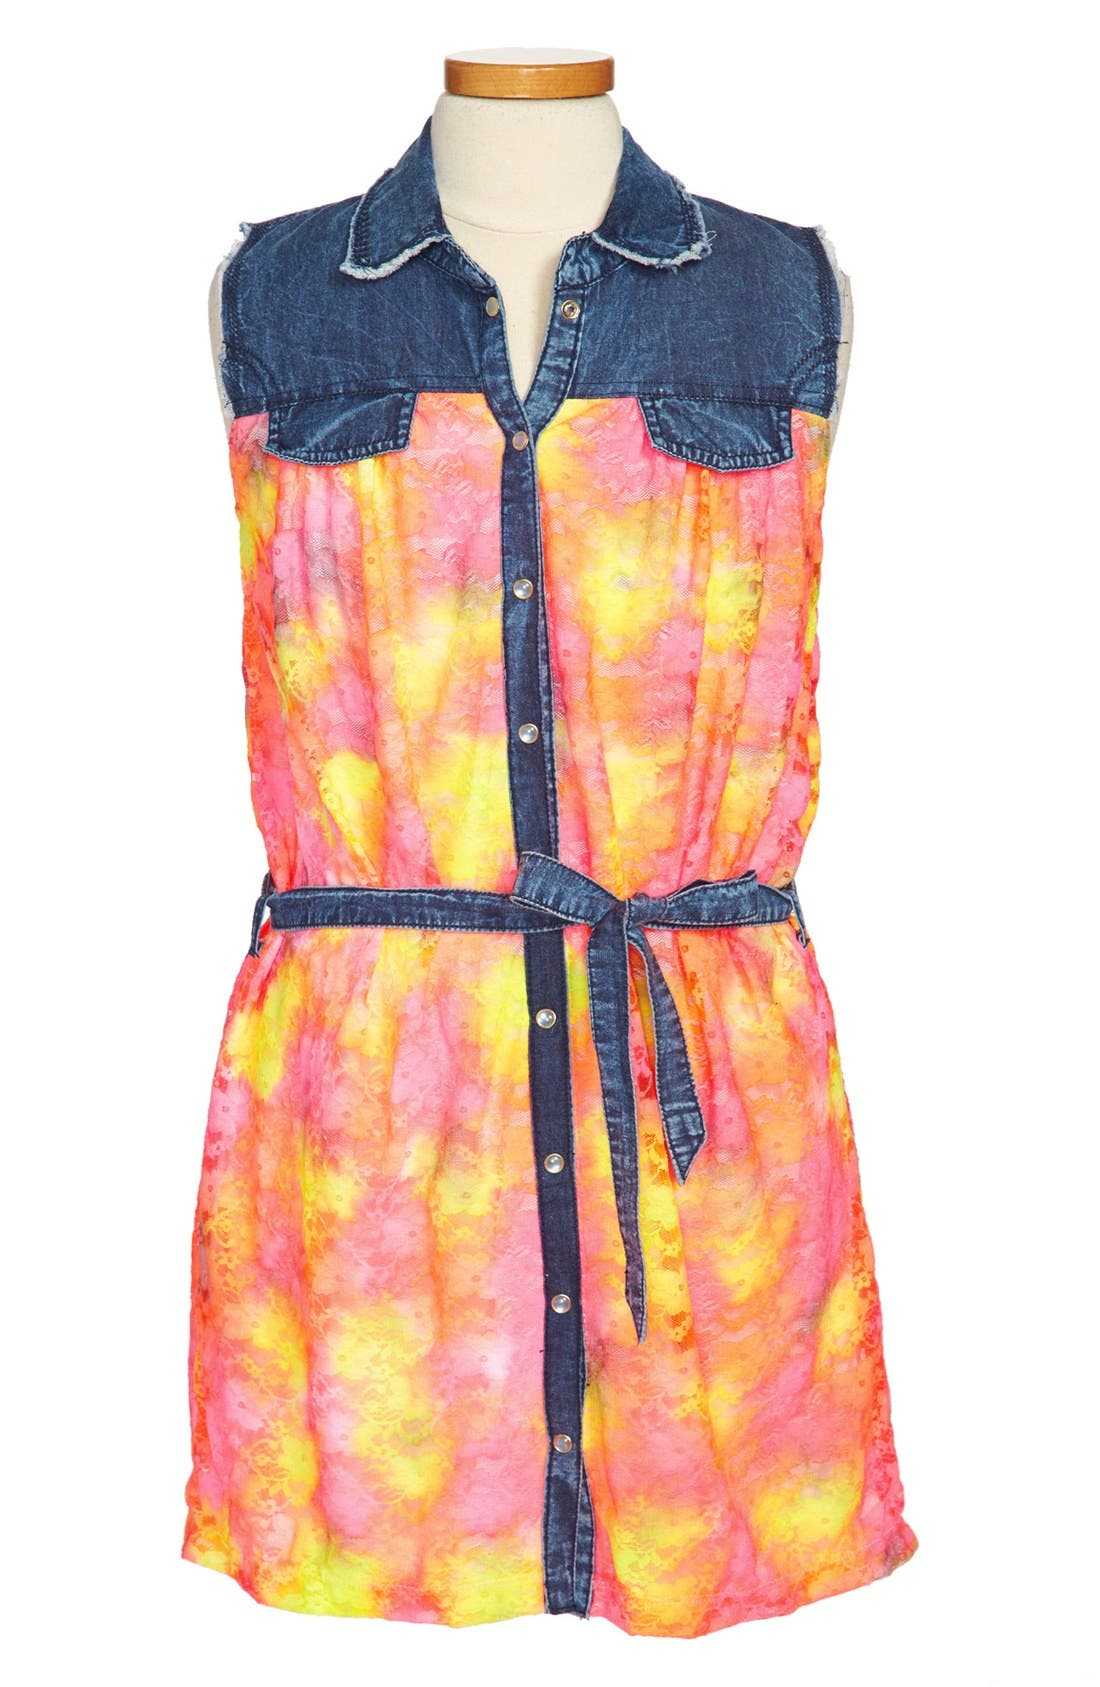 Alternate Image 1 Selected - Flowers by Zoe Neon Denim Dress (Big Girls)